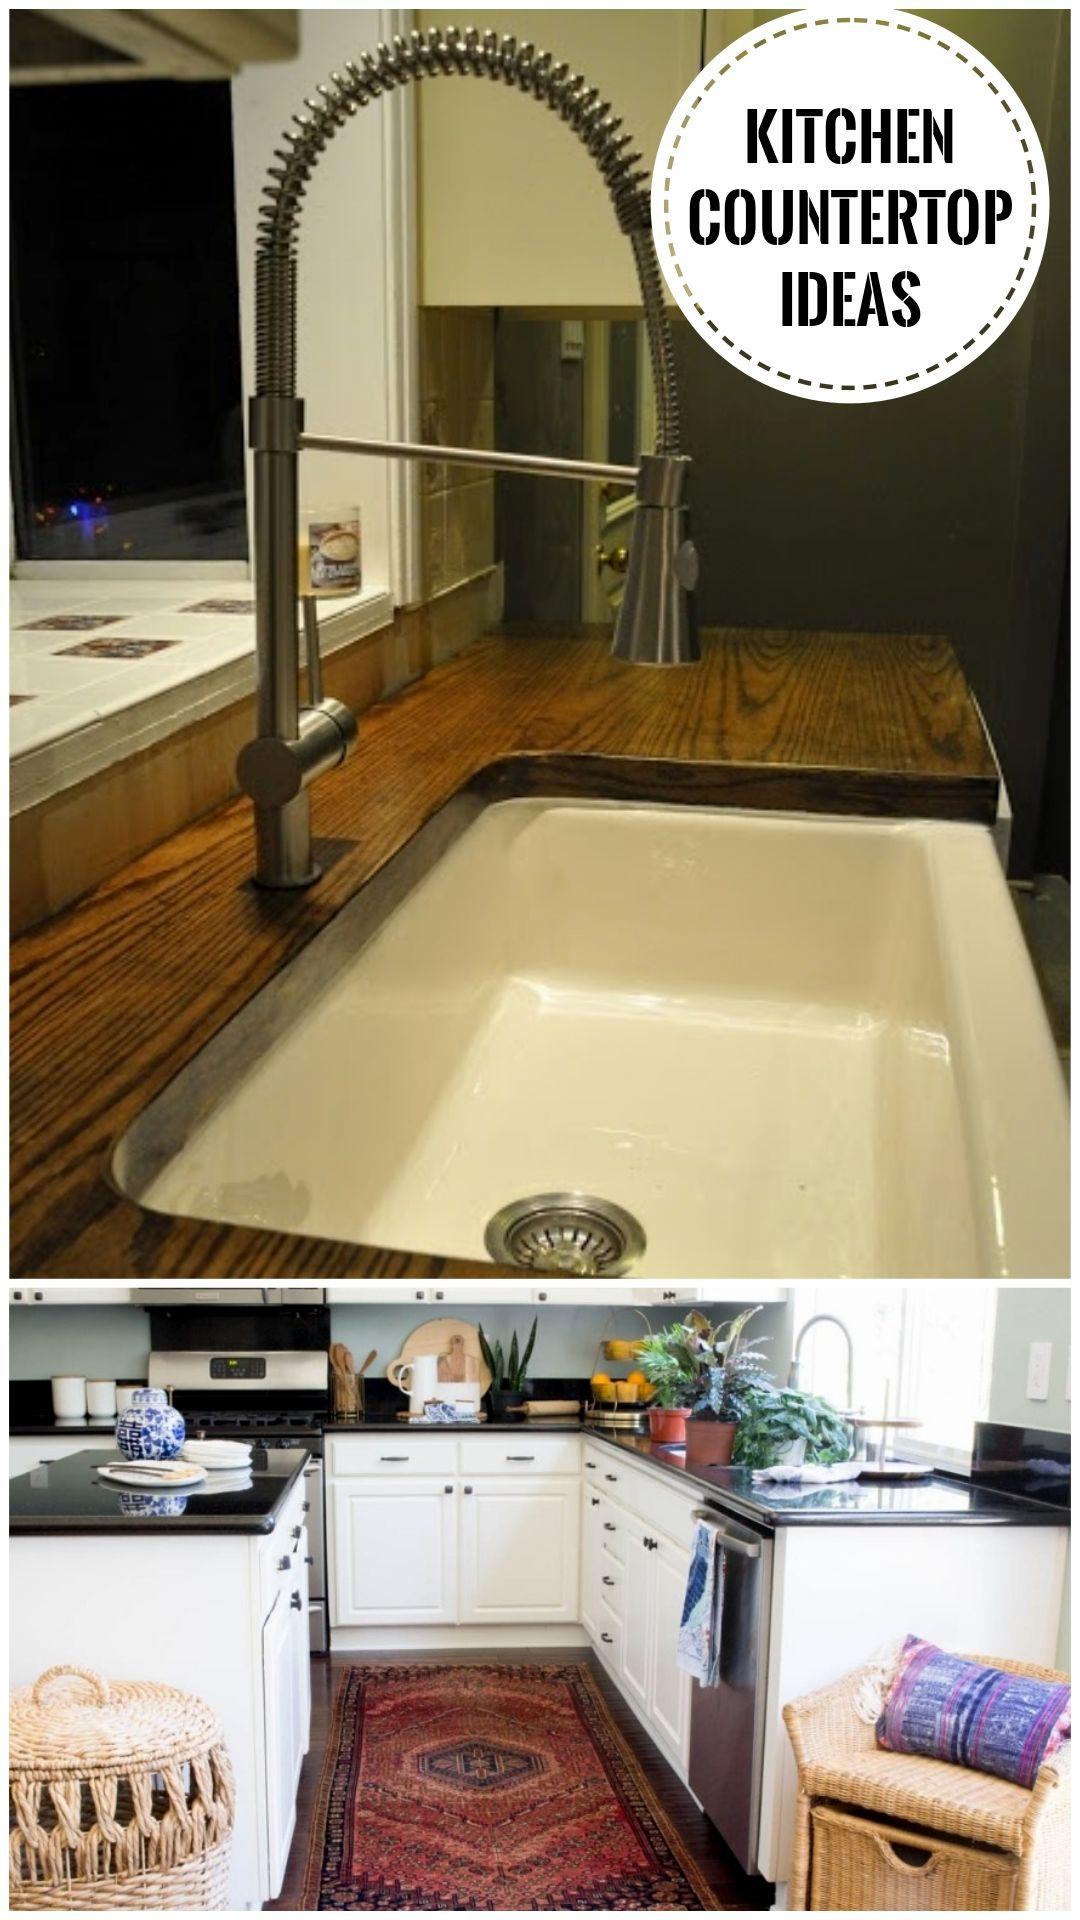 Best Kitchen Countertop Ideas In 2020 Diy Kitchen Countertops